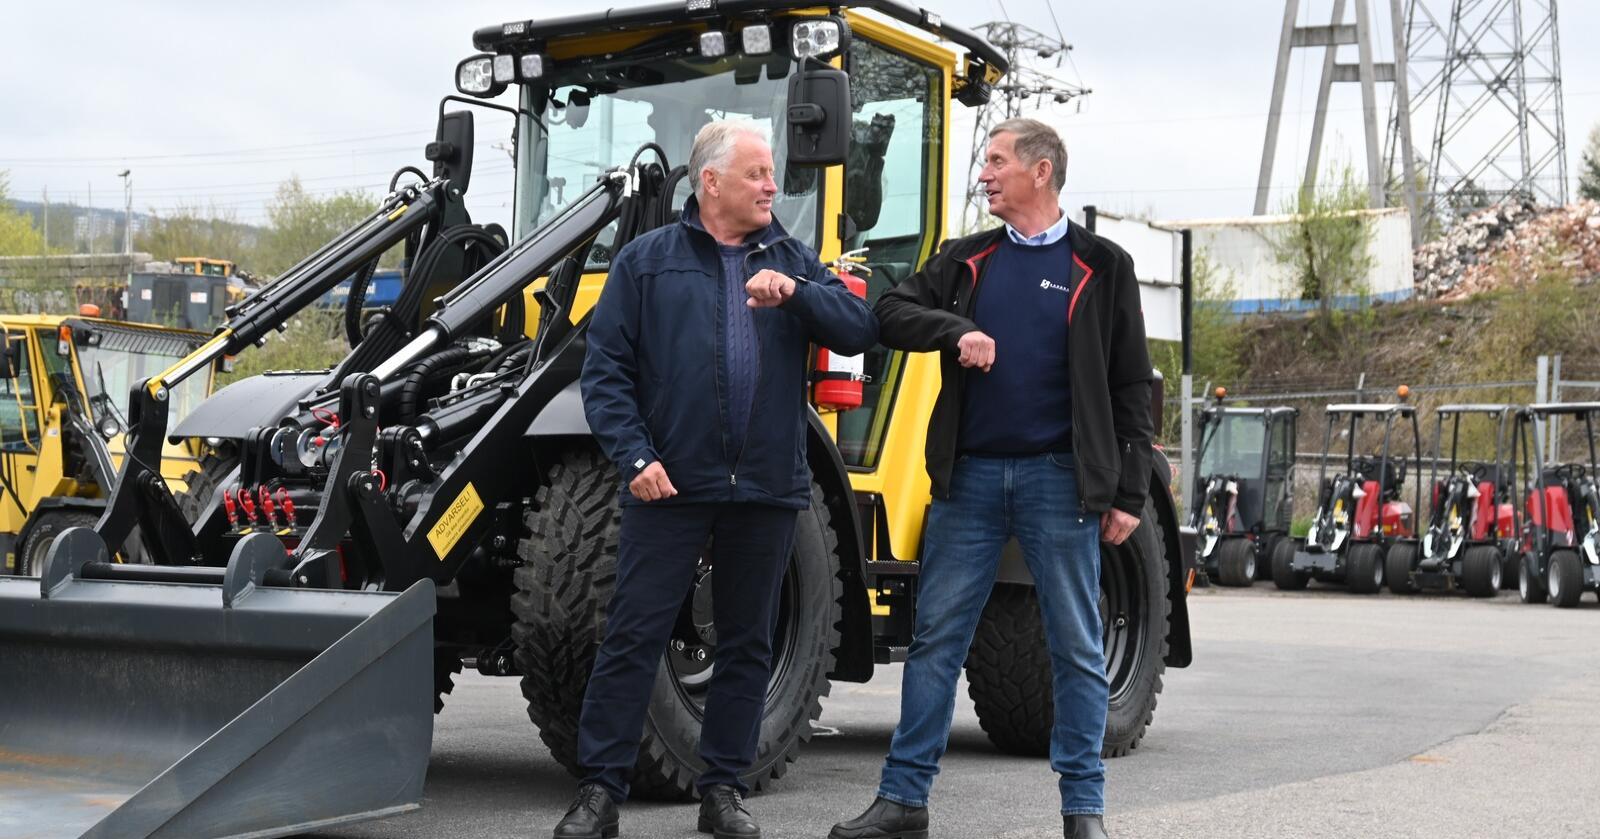 Daglig leder Ole Hveem ( til venstre) i Akershus Traktor og daglig leder i Sandhaug AS, Rune Sandhaug skal samarbeide om å få flere Lundberg-maskiner ut til Norske kunder.